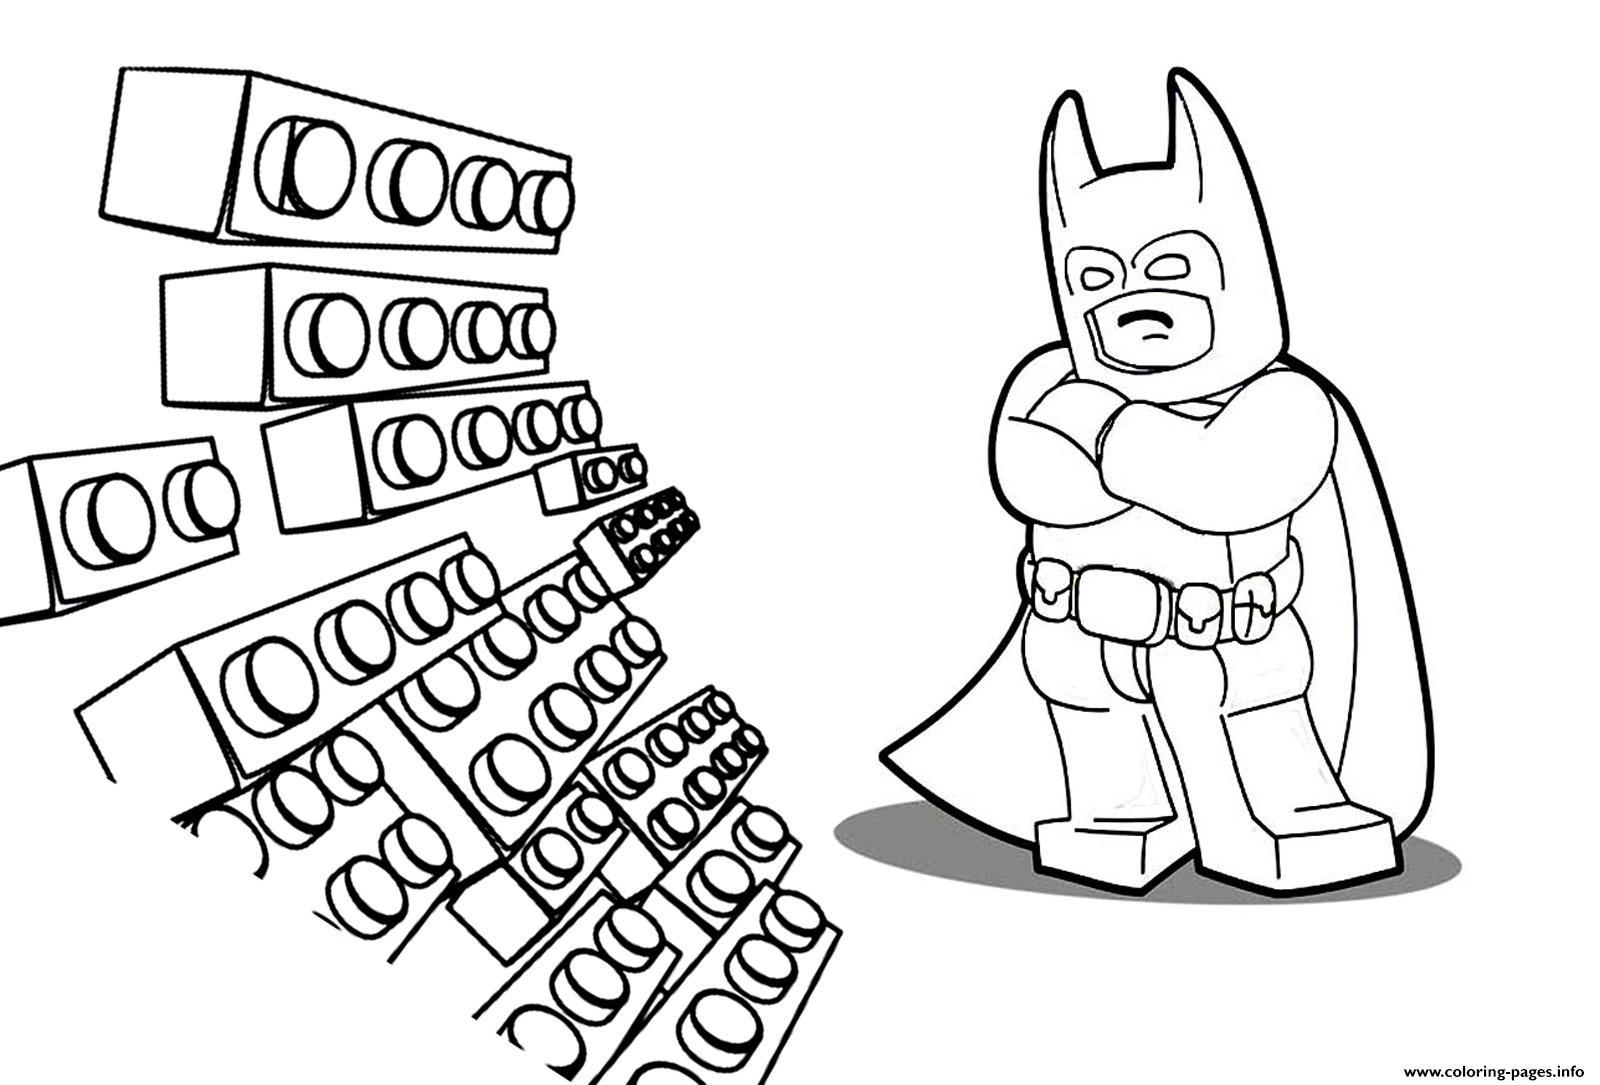 1487370293Lego Batman Movie Adventure Kids Lego Printable Coloring Pages Book 17619 Amazing Info